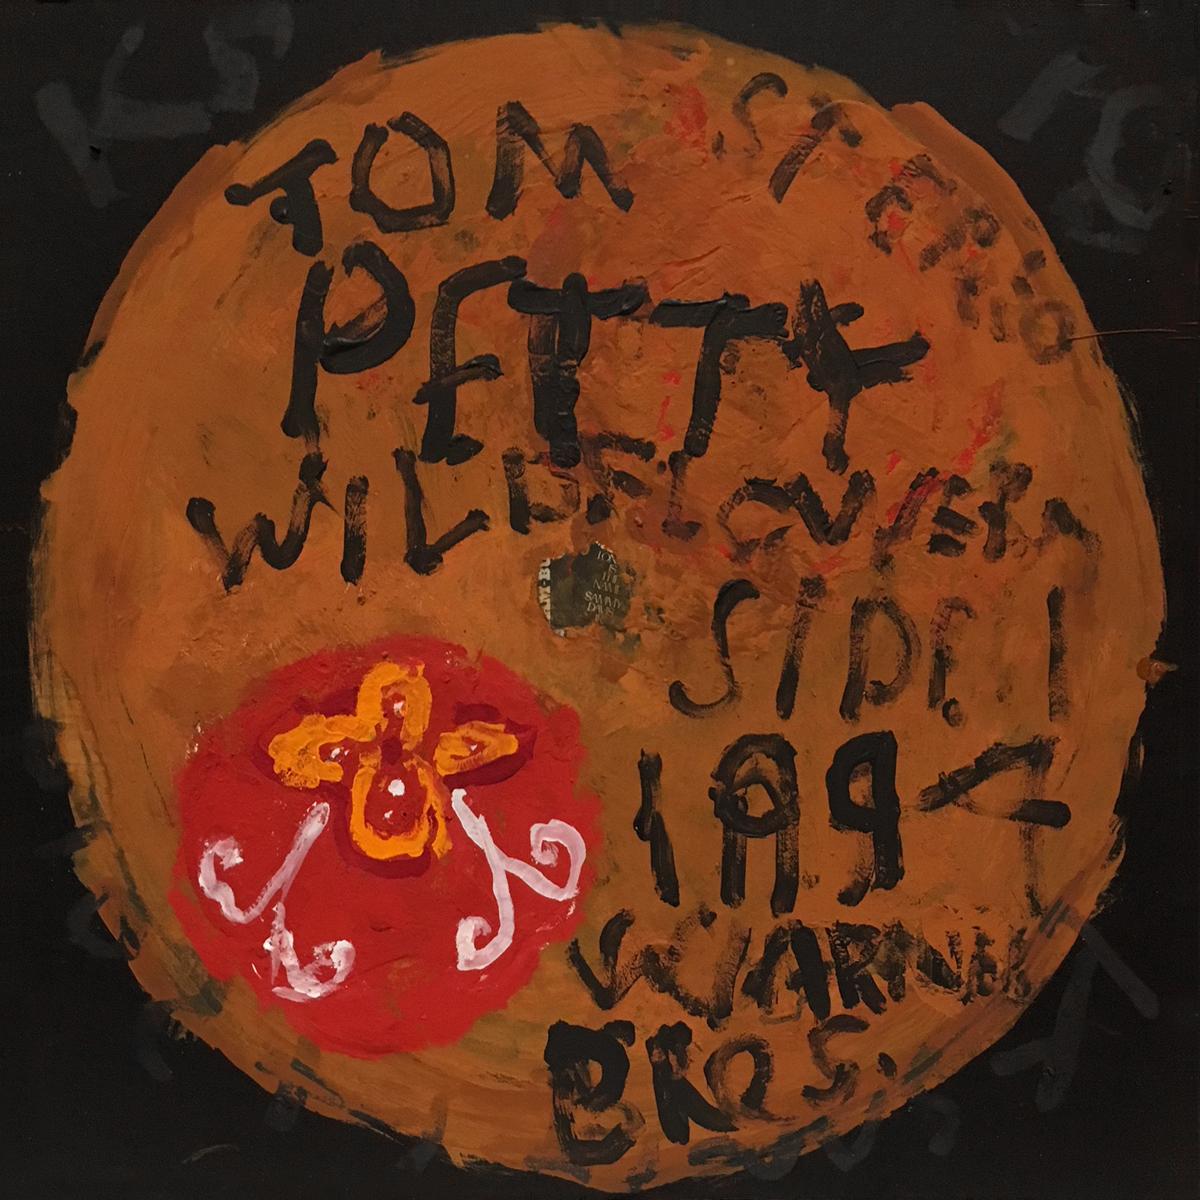 Tom Petty / Wildflowers #4